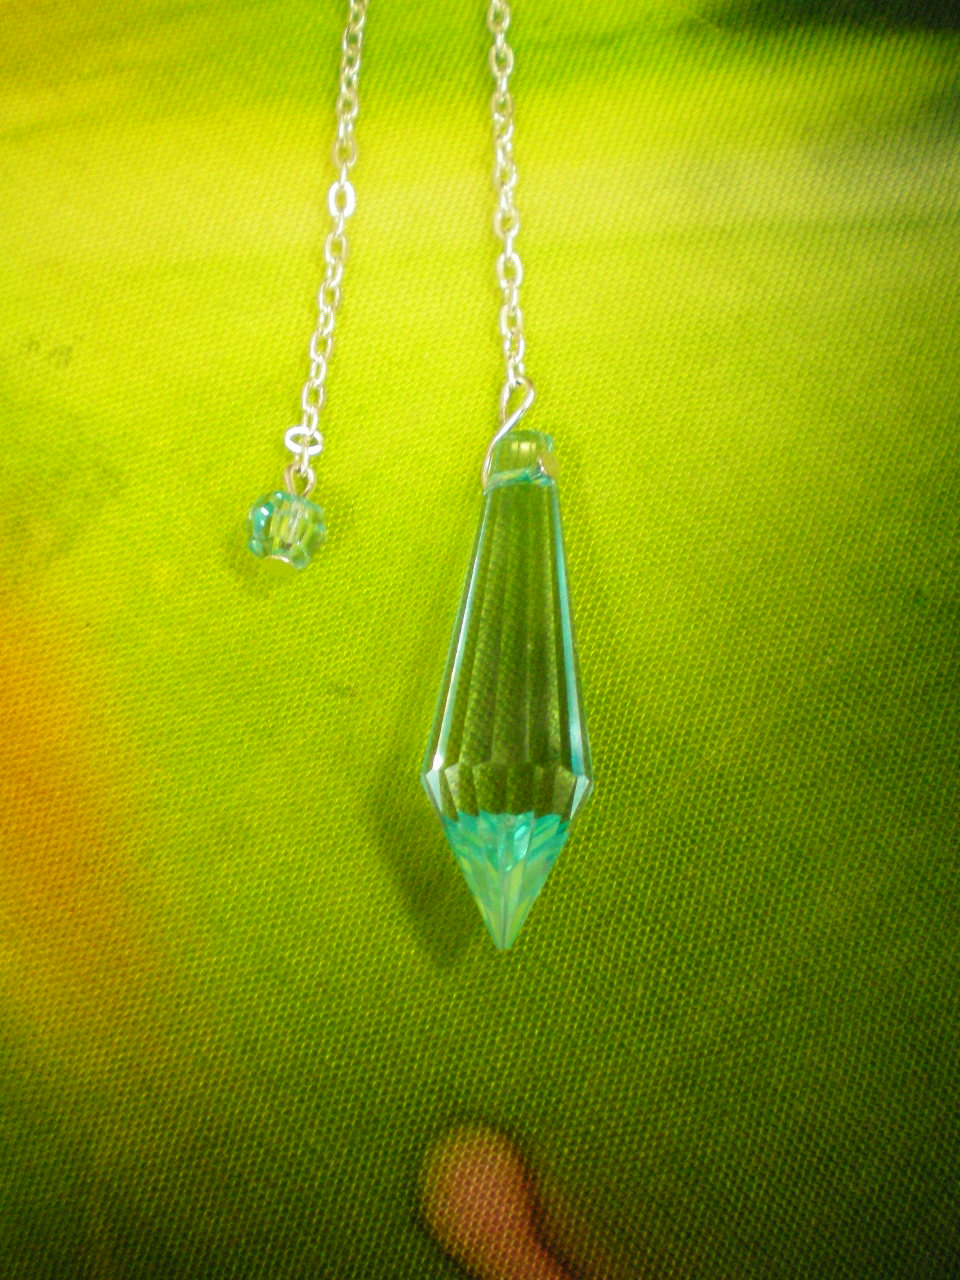 Siderické kyvadlo - 5 Briliant - sv.modré křšťálové sklo